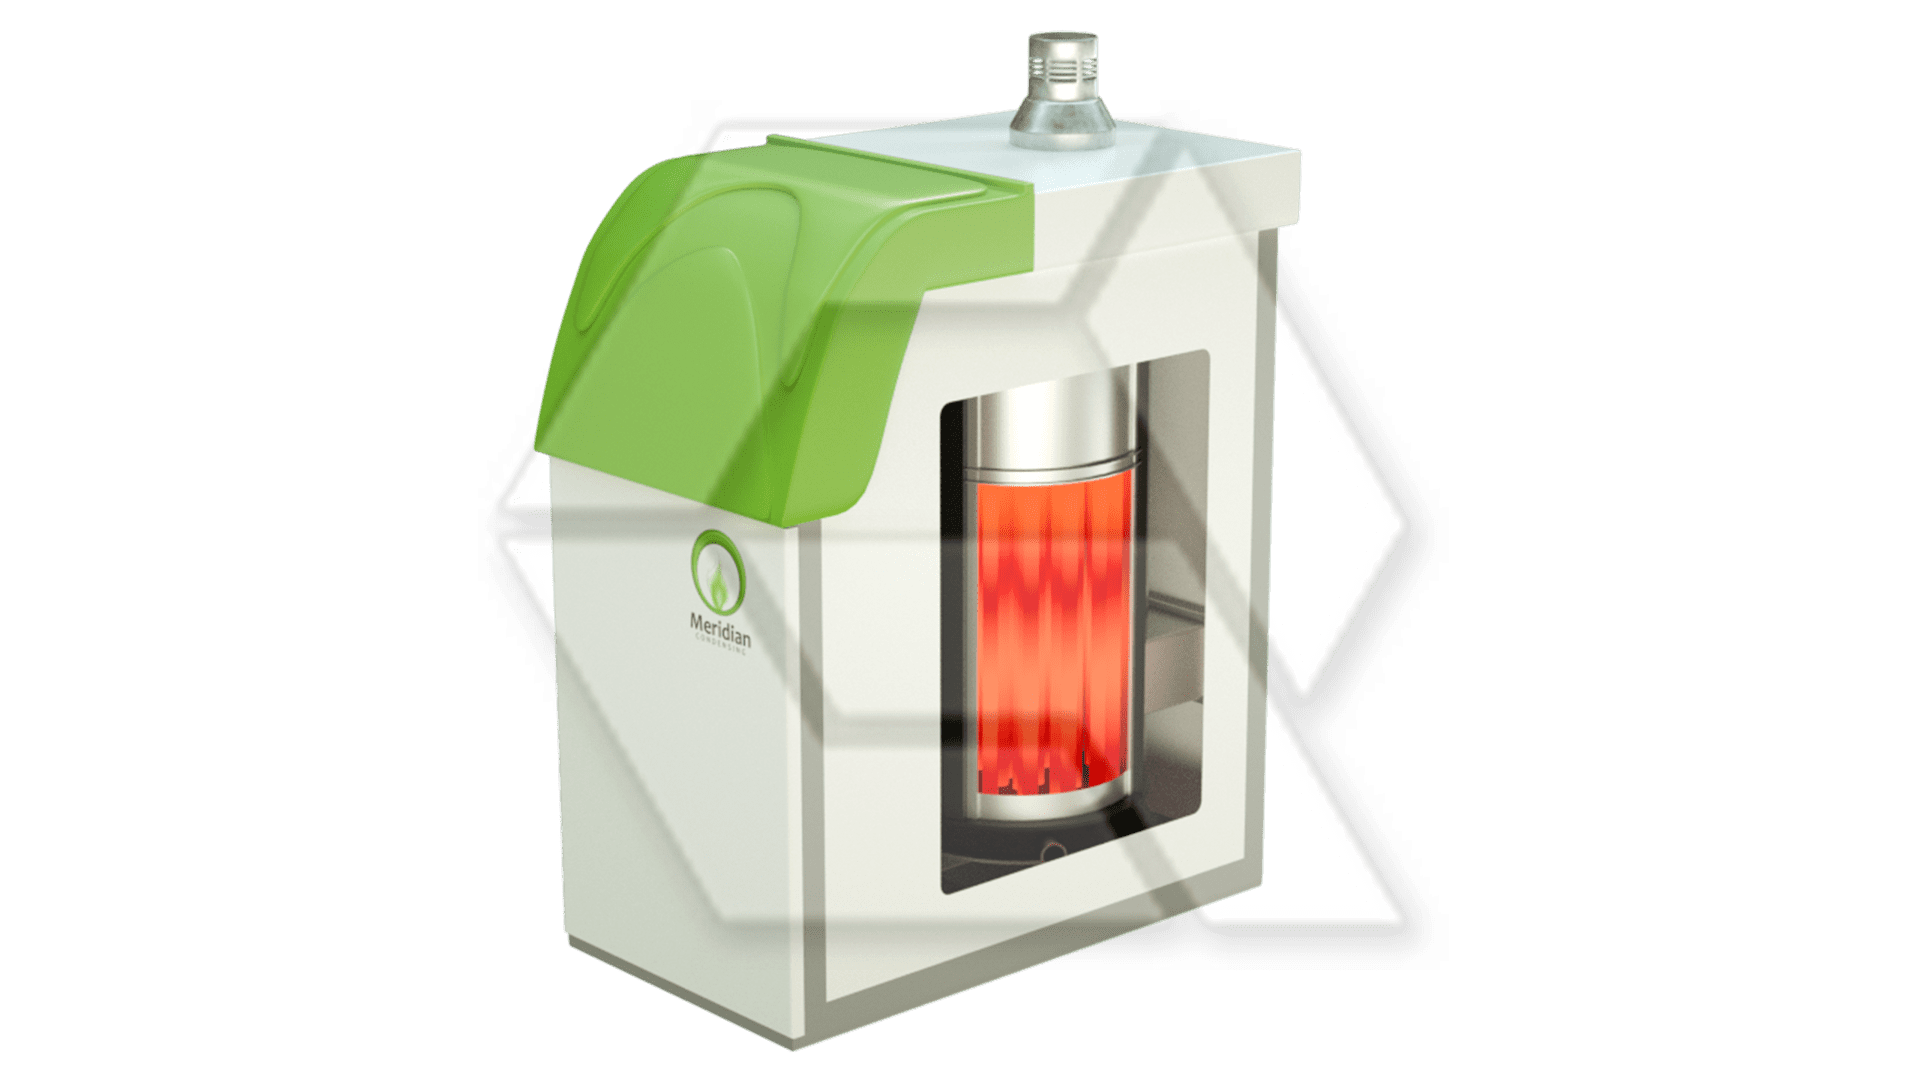 Meridian Boiler Open